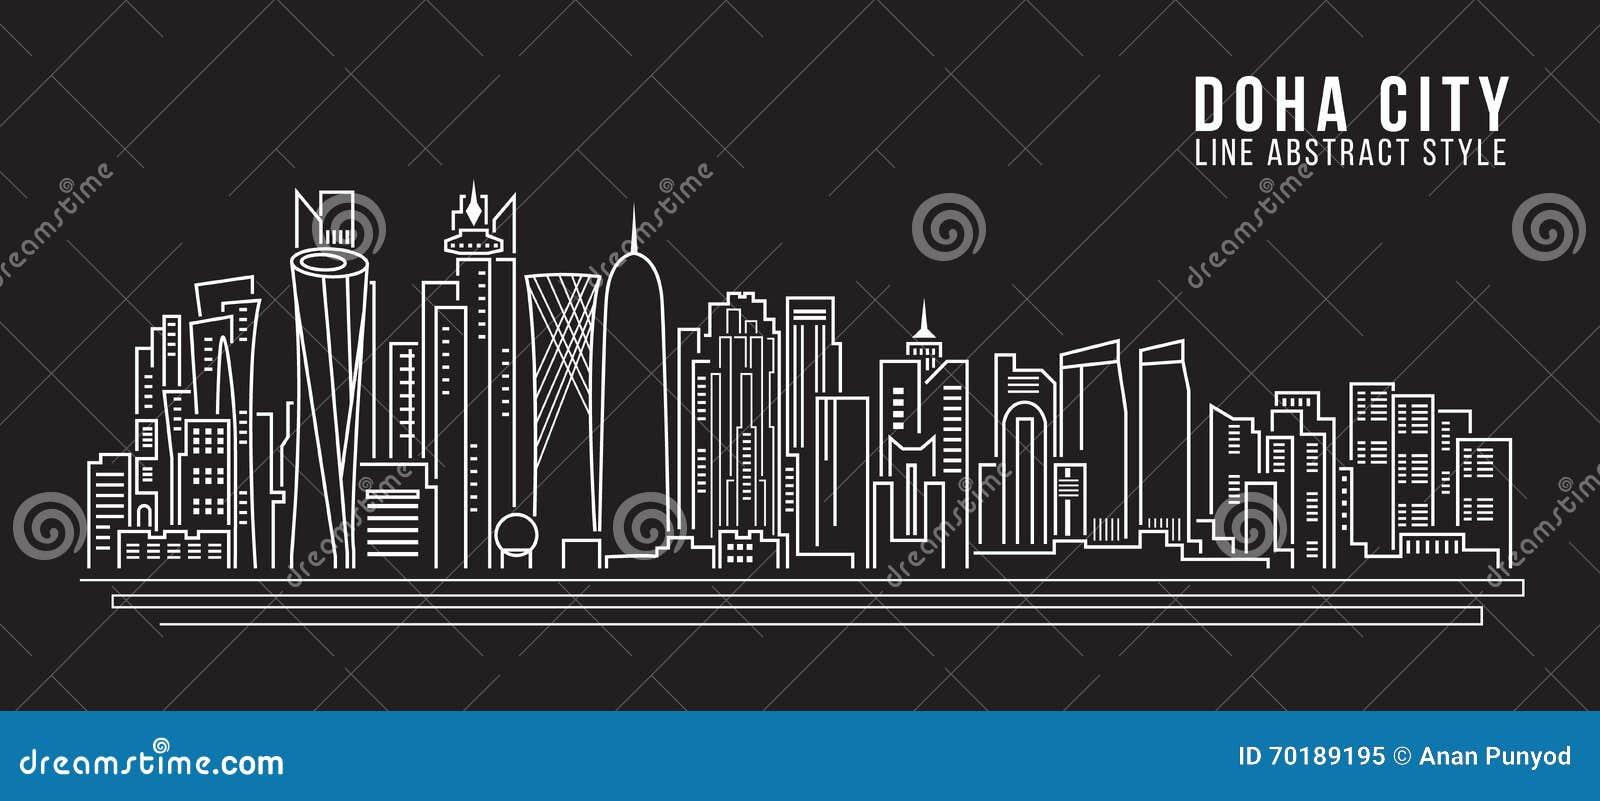 Line Art City : Cityscape building line art vector illustration design doha city